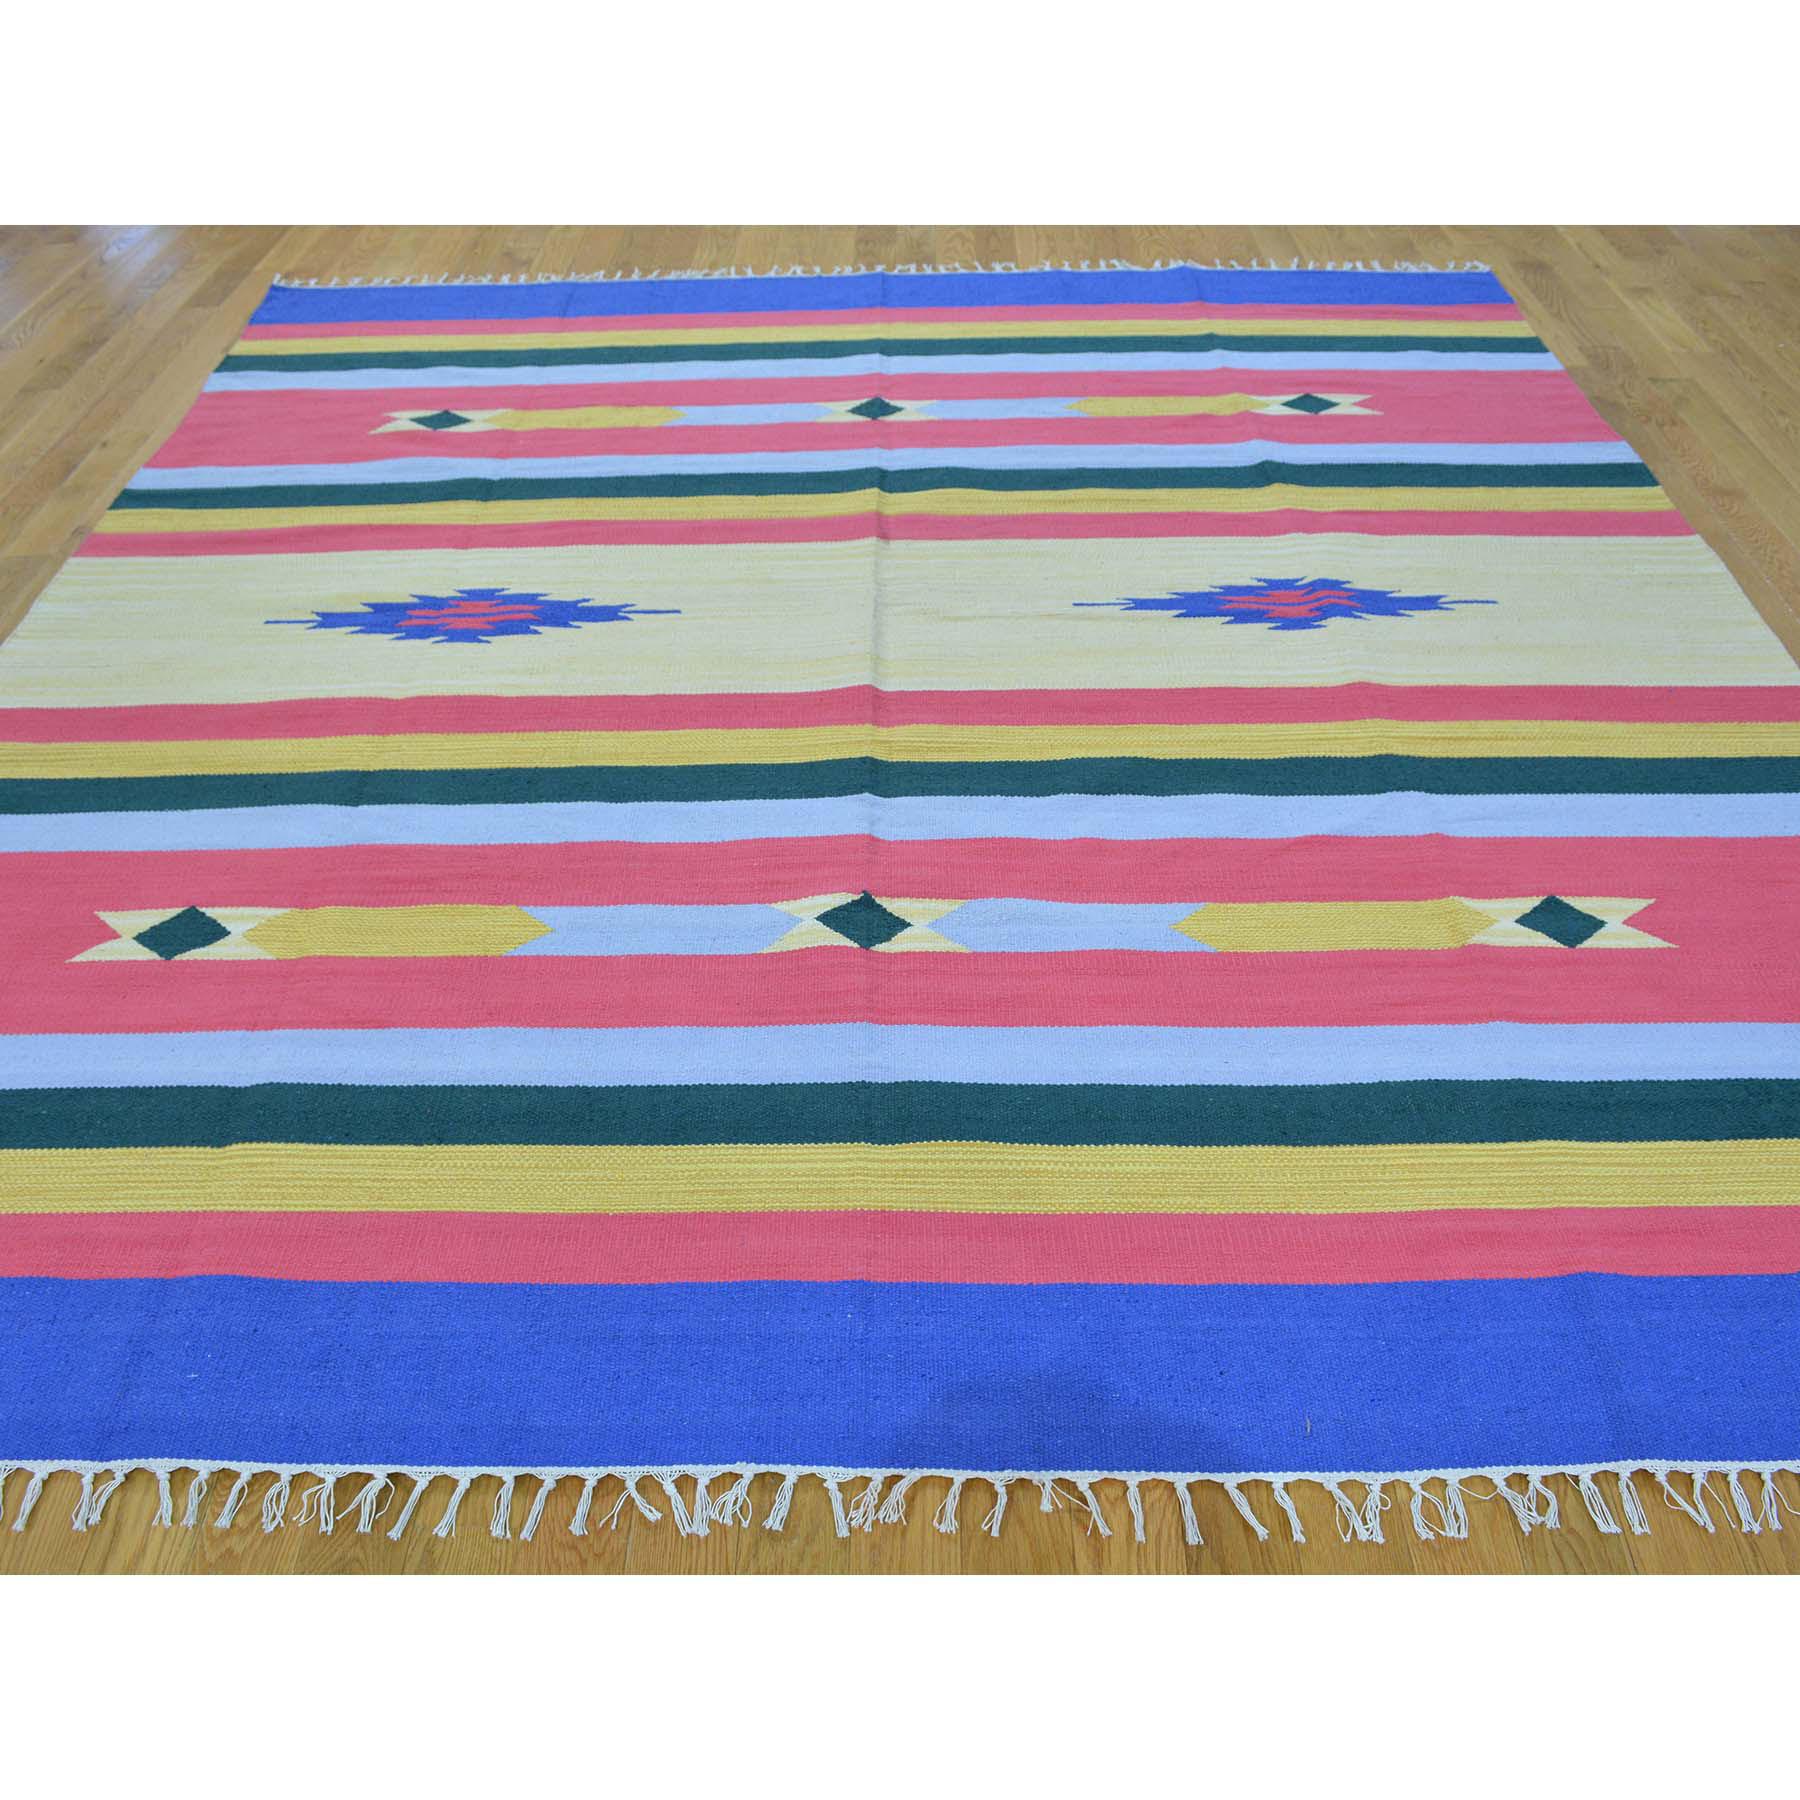 7-10 x8-3  Hand Woven Killim Flat Weave Squarish Southwestern Design Rug